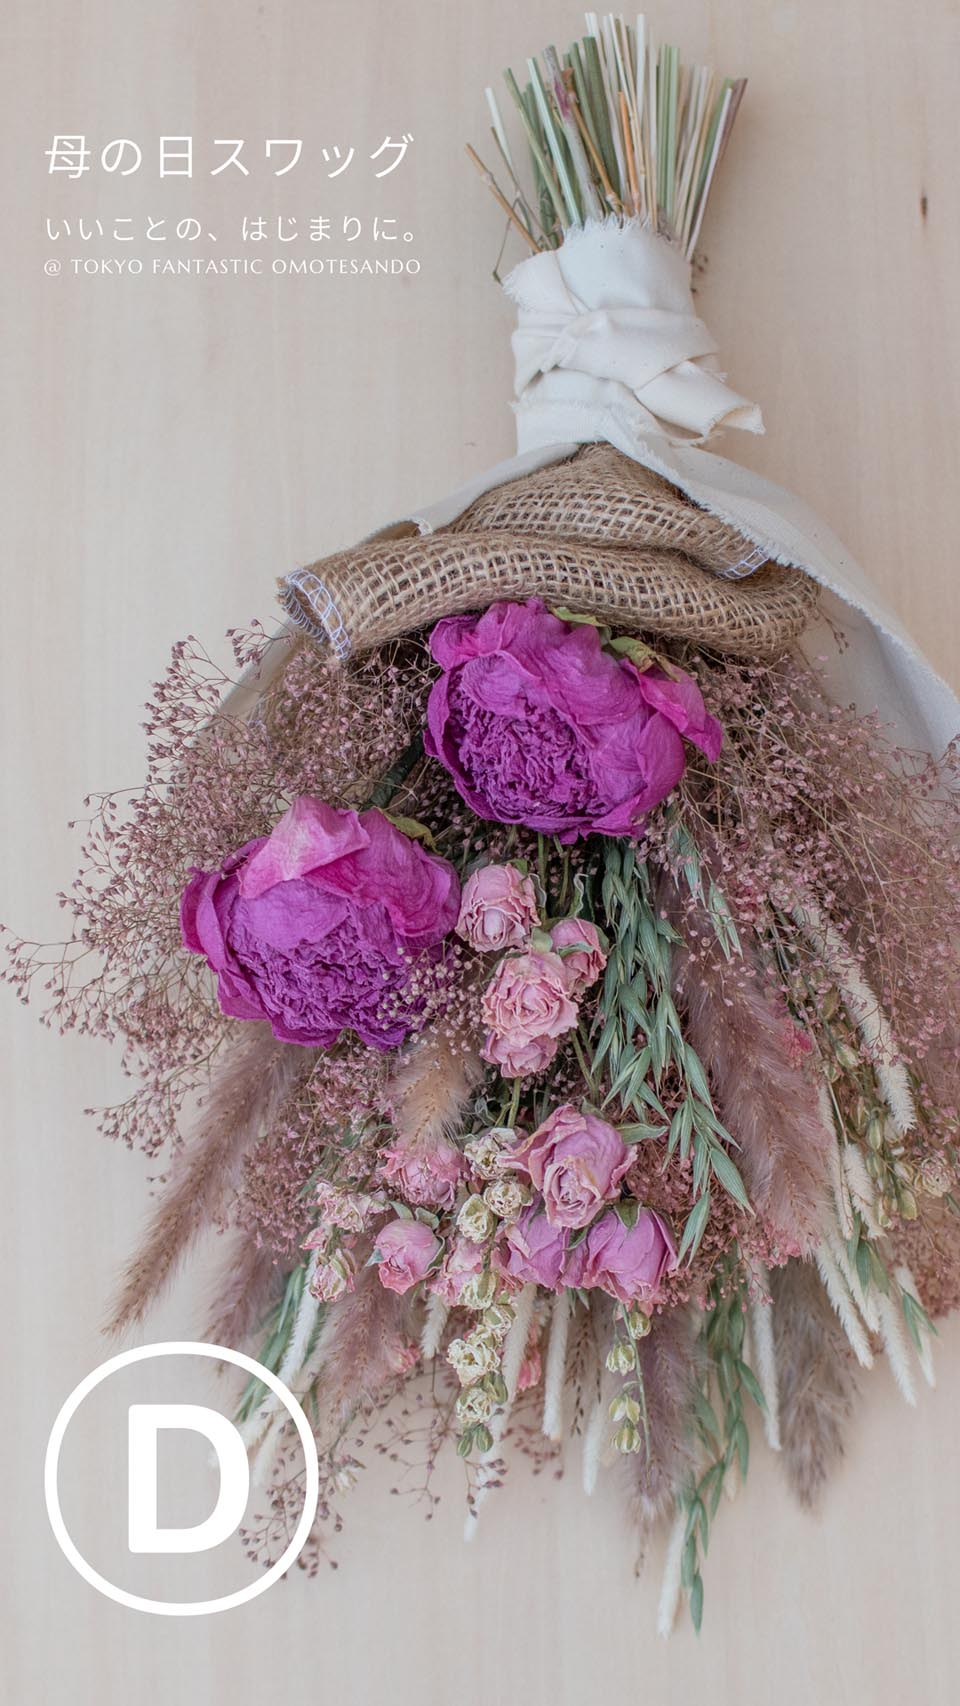 Ⓓ Tida Flowerの母の日スワッグ 10,000円(税別)